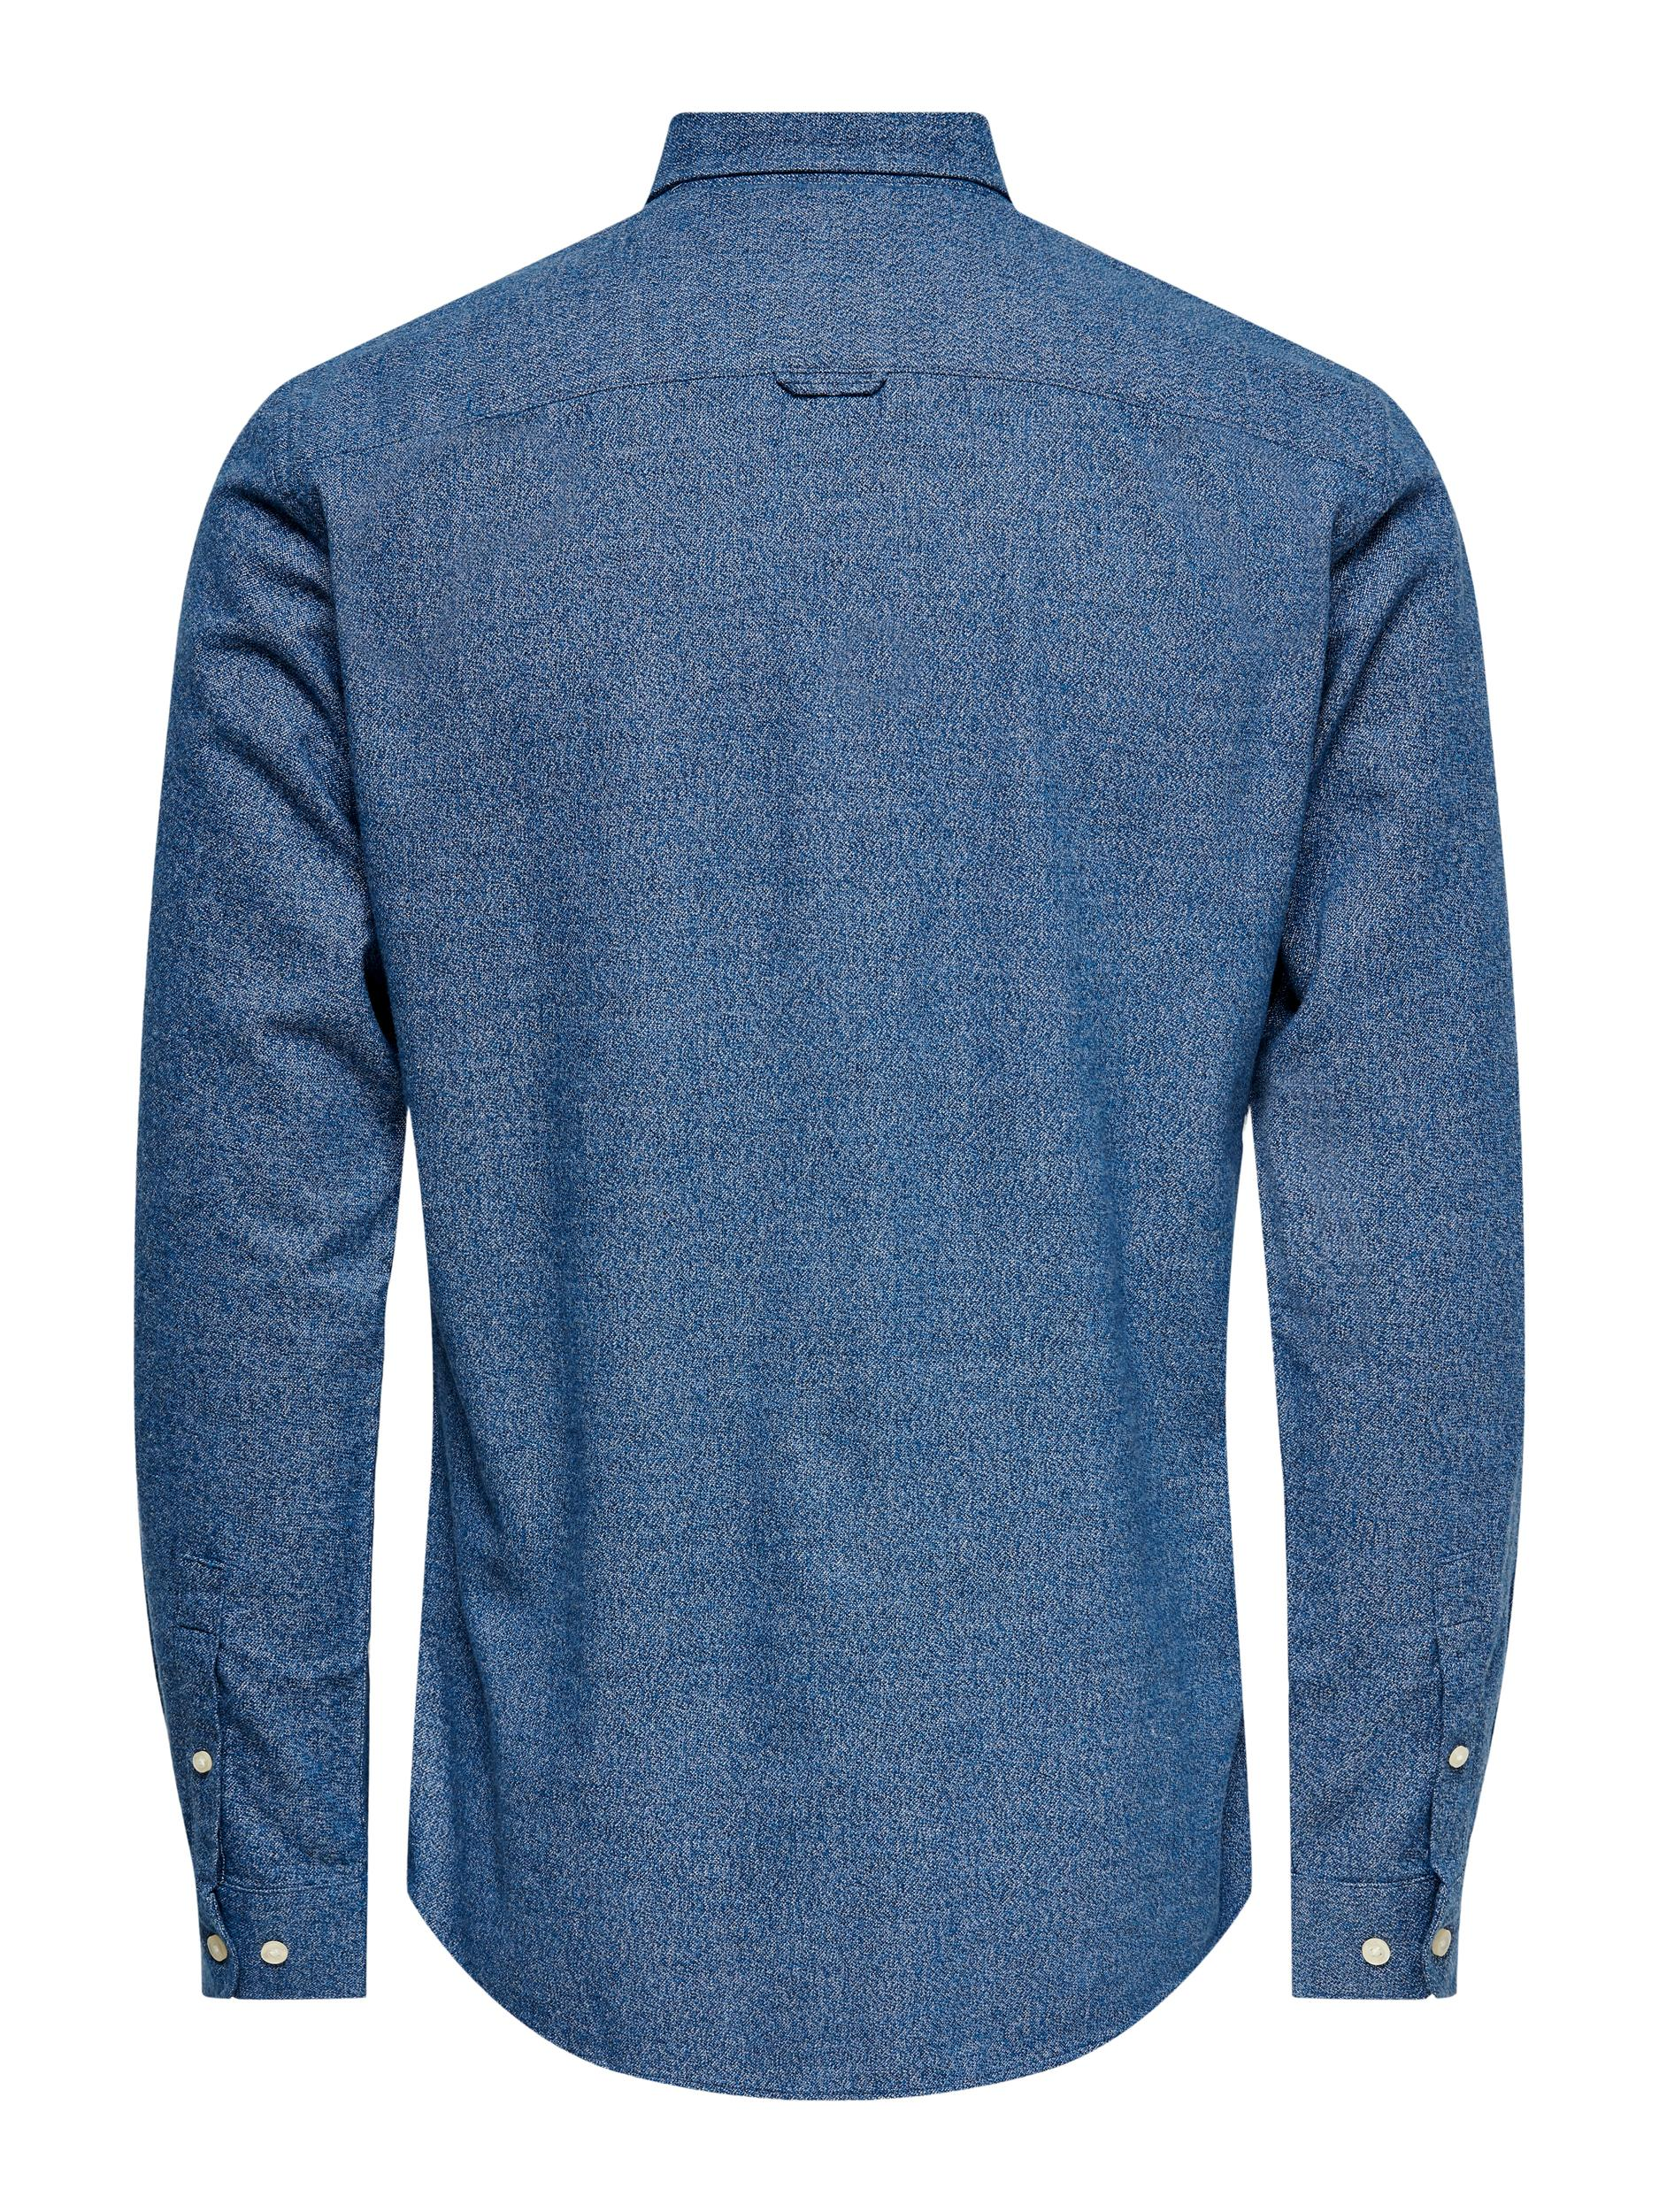 Only and Sons Niko LS skjorte, Dress Blue, Medium